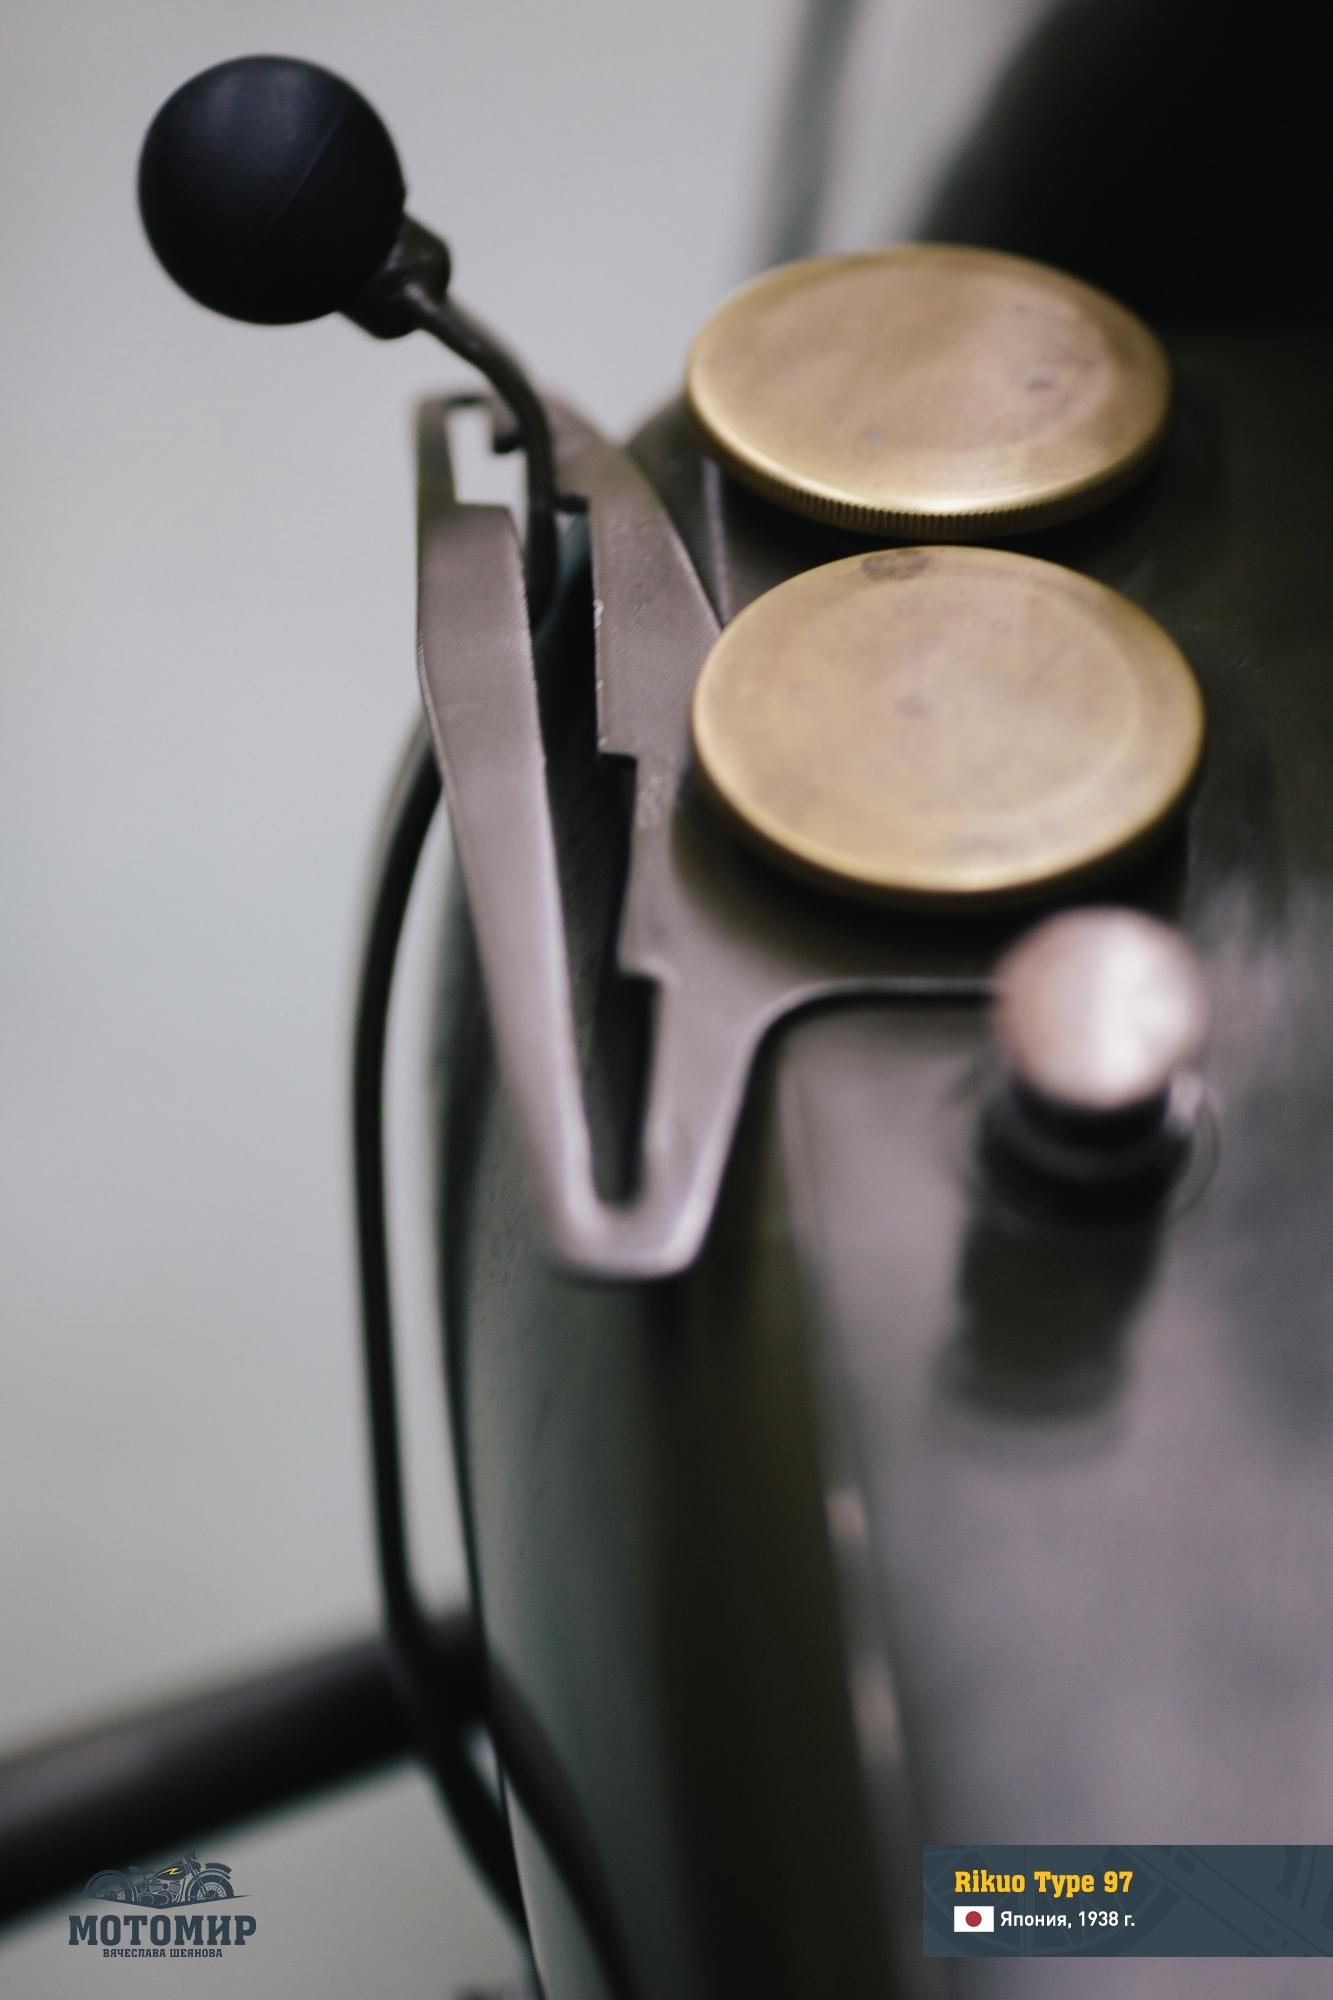 rikuo-type-97-1938-201502-web-10